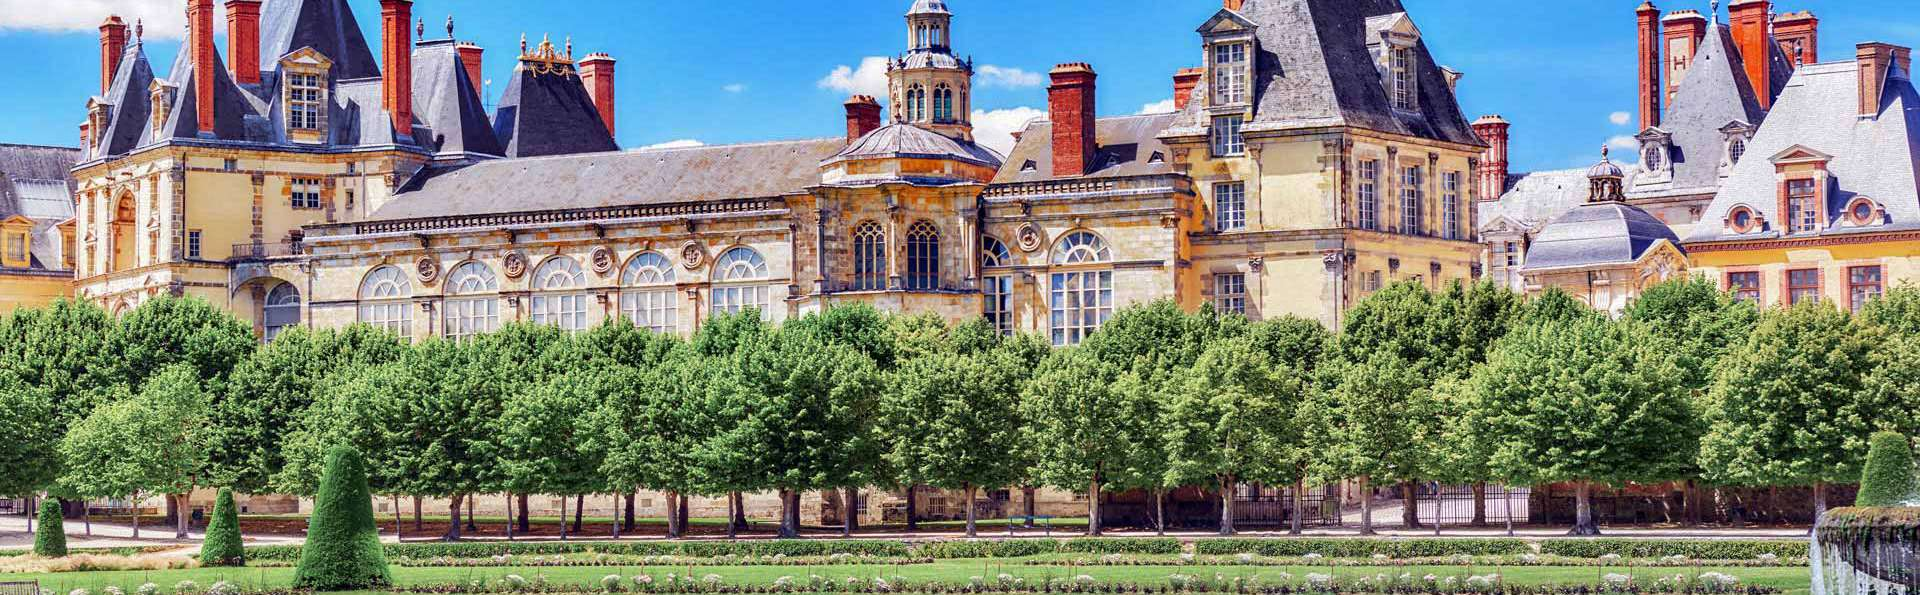 Déclic Hôtel - EDIT_DESTINATION_03.jpg